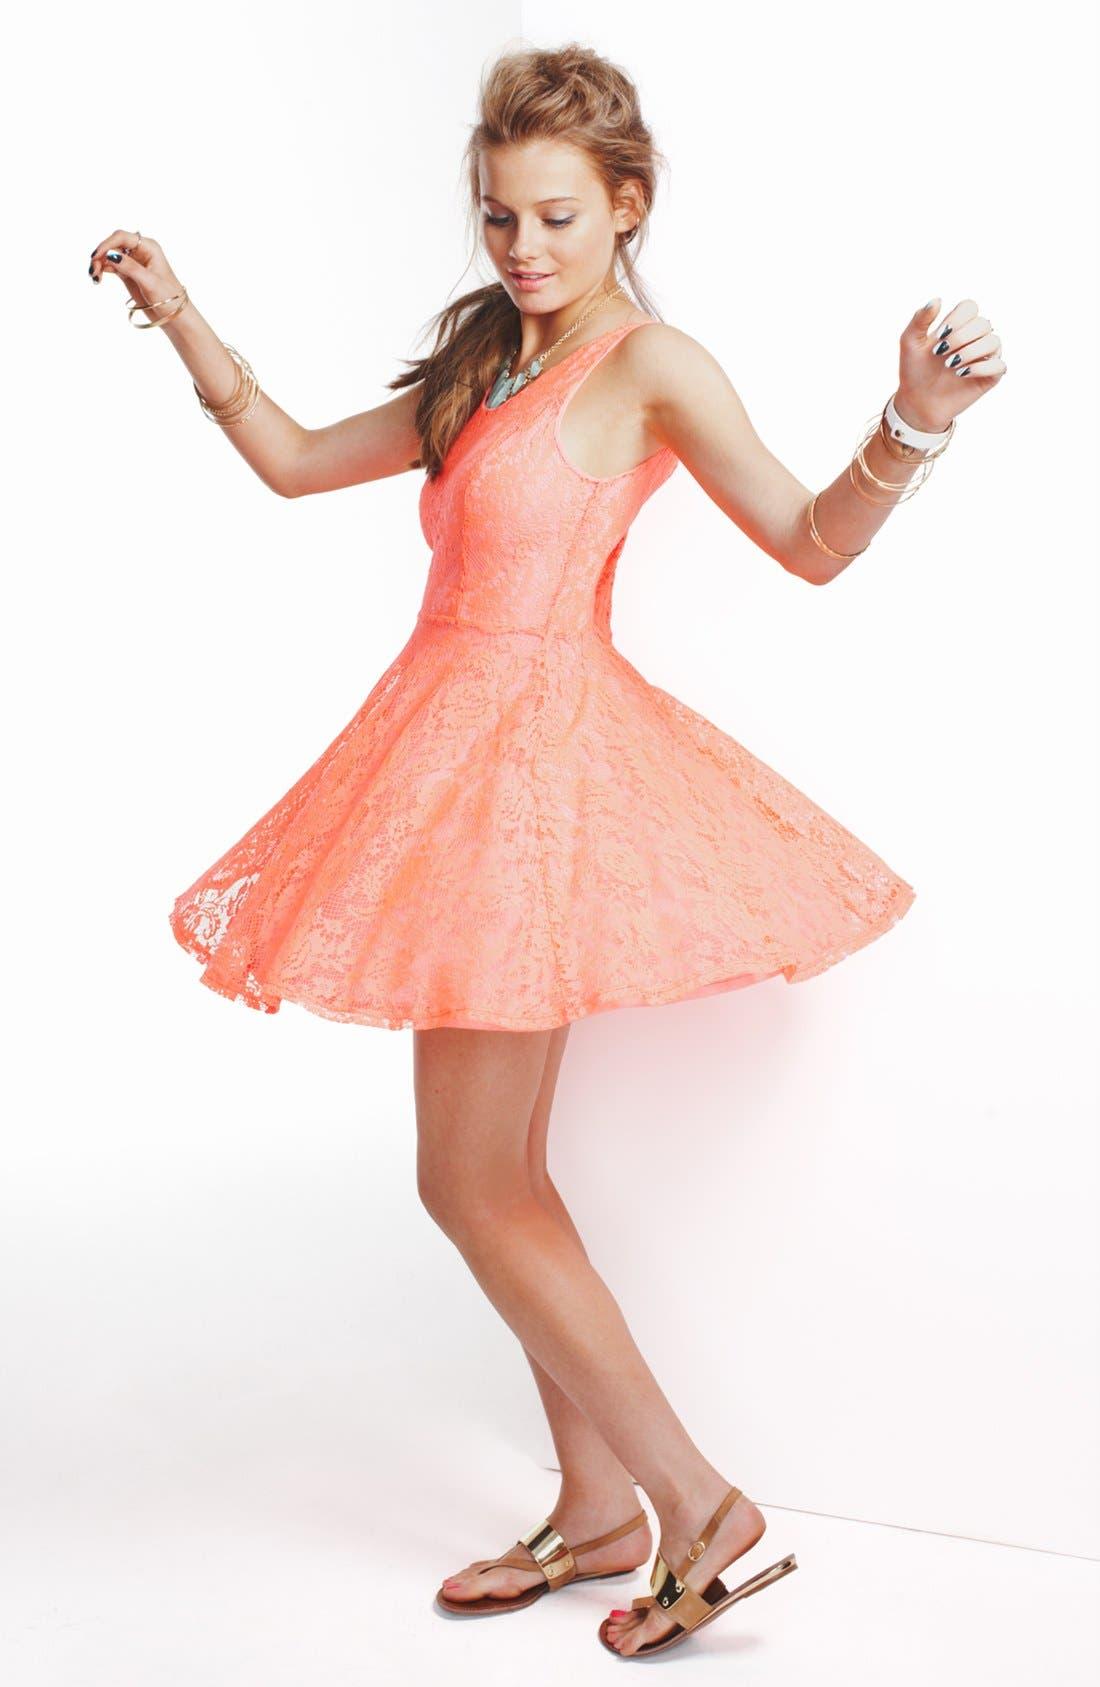 Main Image - Robin K Skater Dress & Accessories